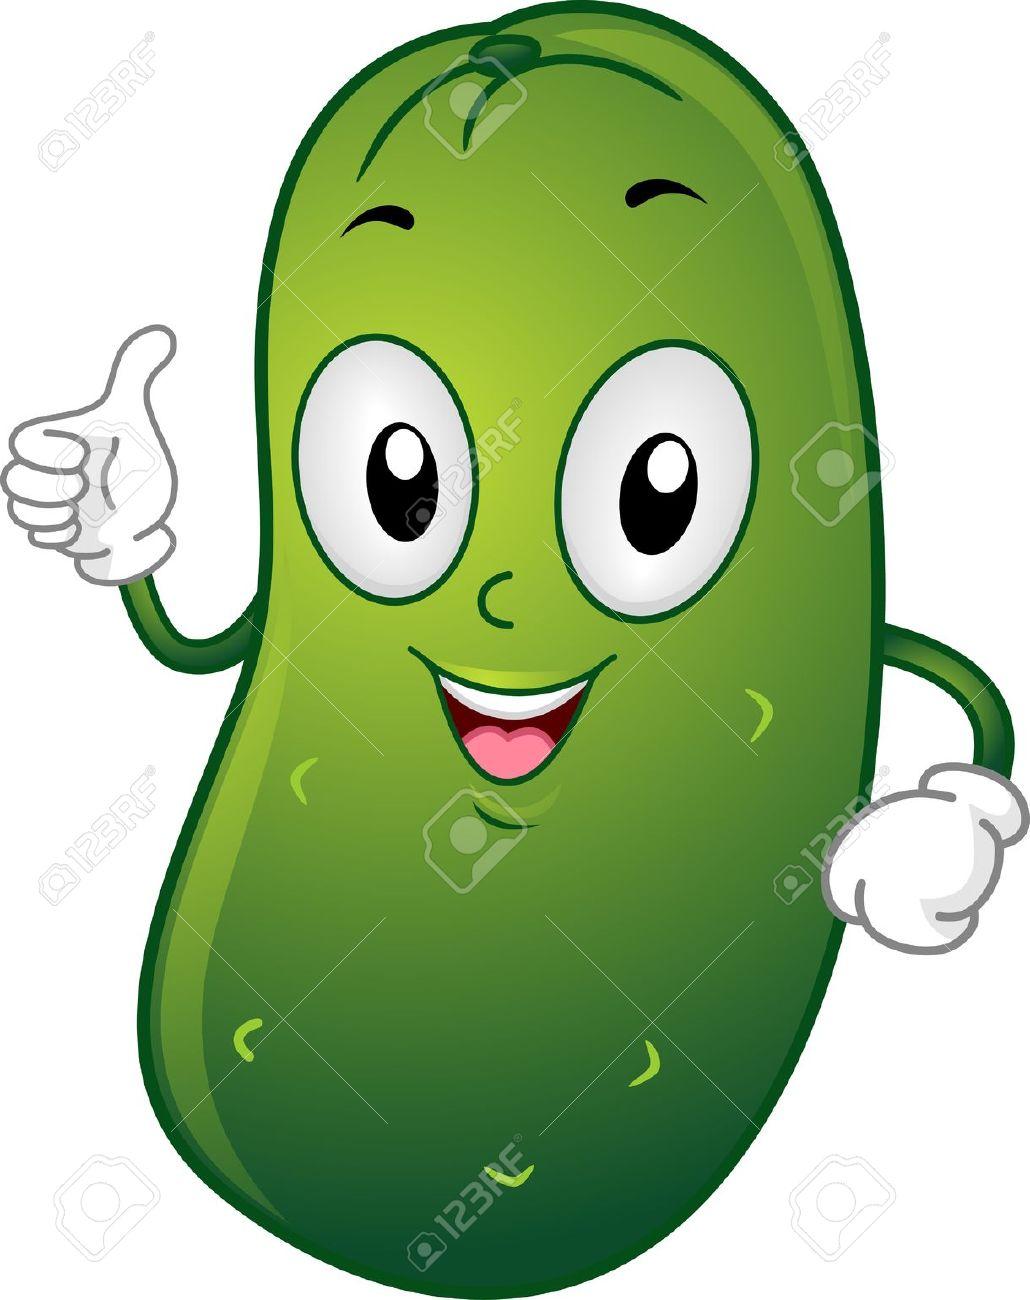 Funny Pickle Clipart #1-Funny Pickle Clipart #1-5